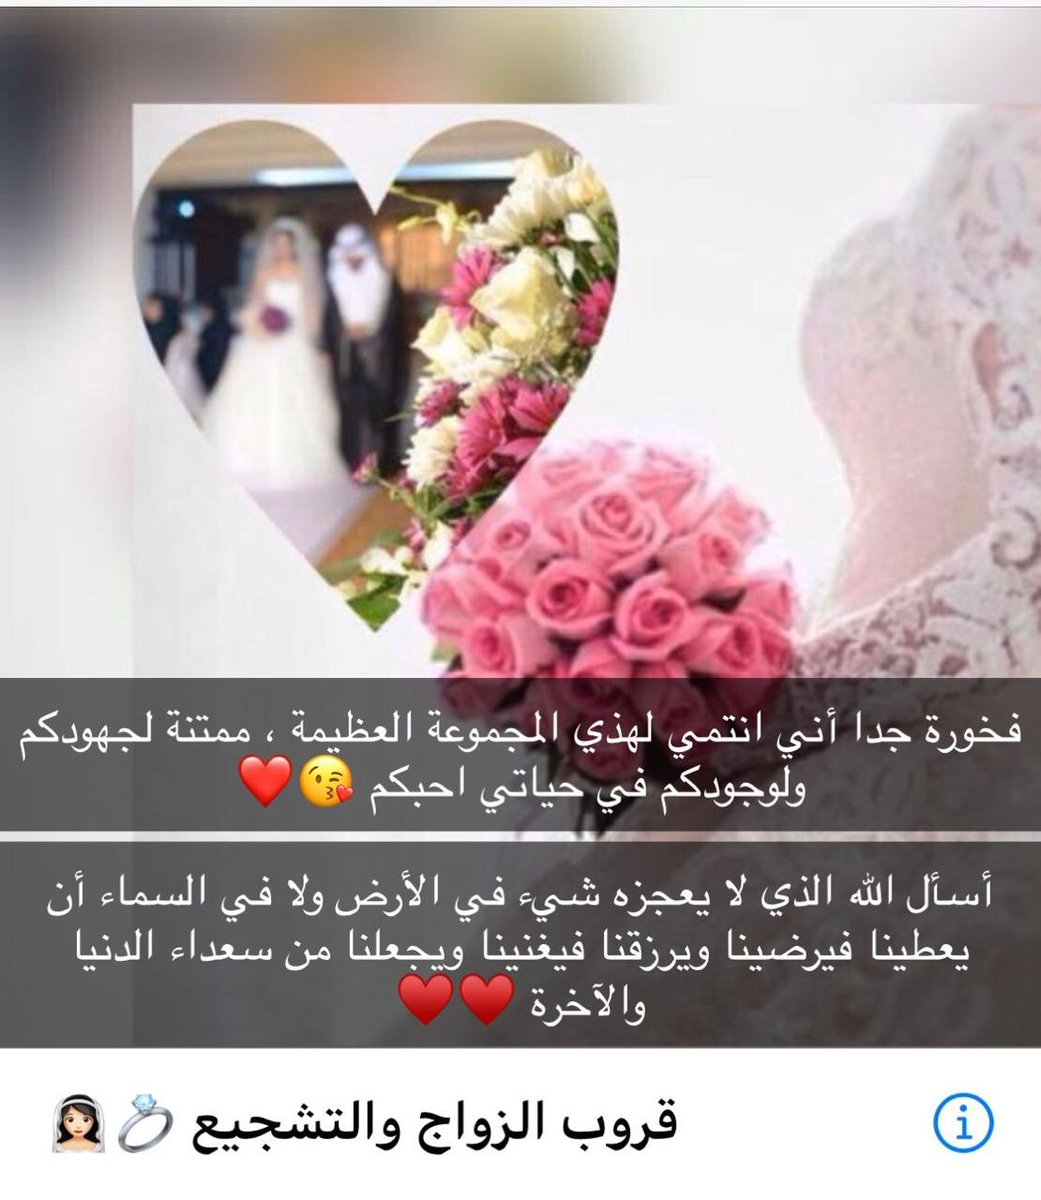 سلطان عبدالله الشرقي Op